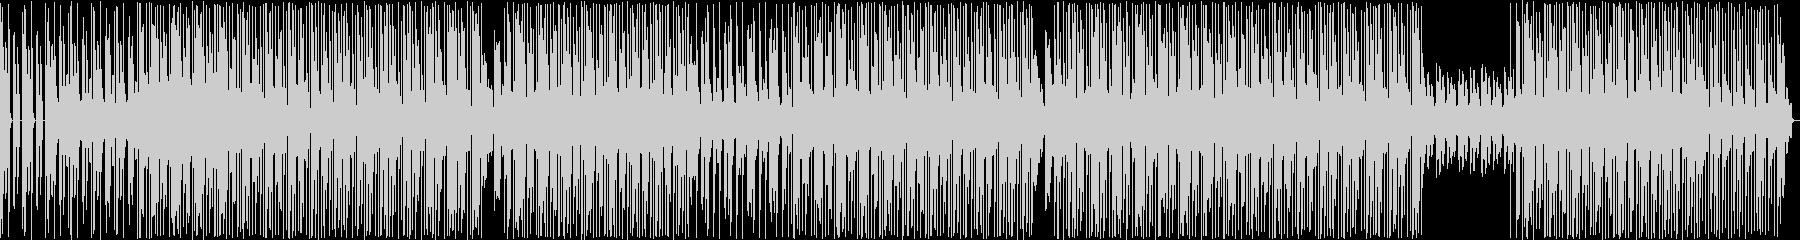 HIPHOPトラック 爽やか系 軽やか系の未再生の波形